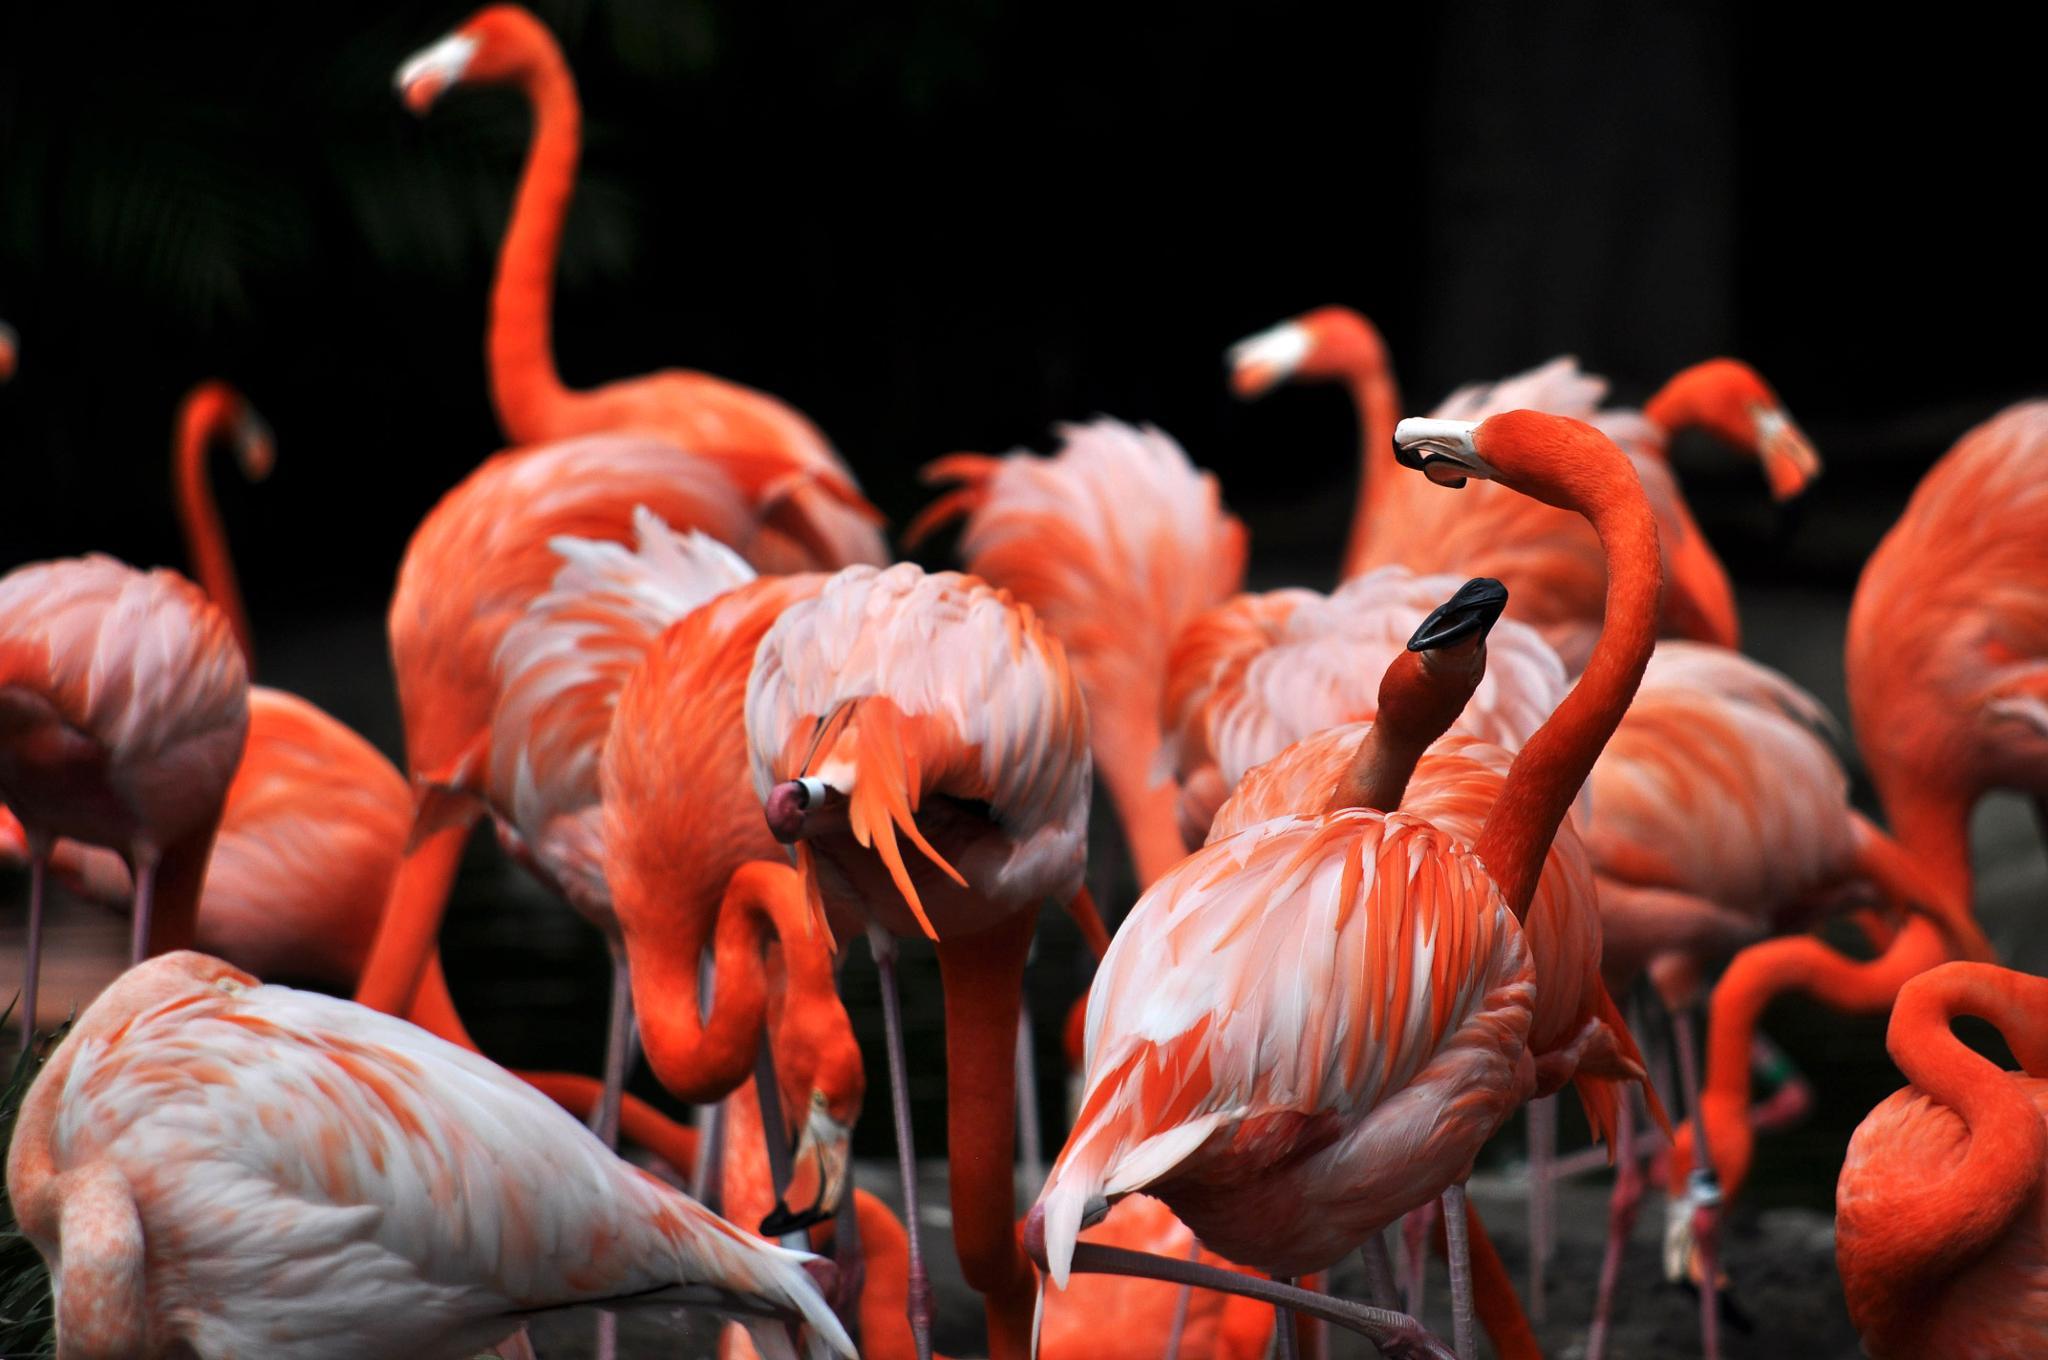 Flamingo Party !!!! by Jaime Cantu